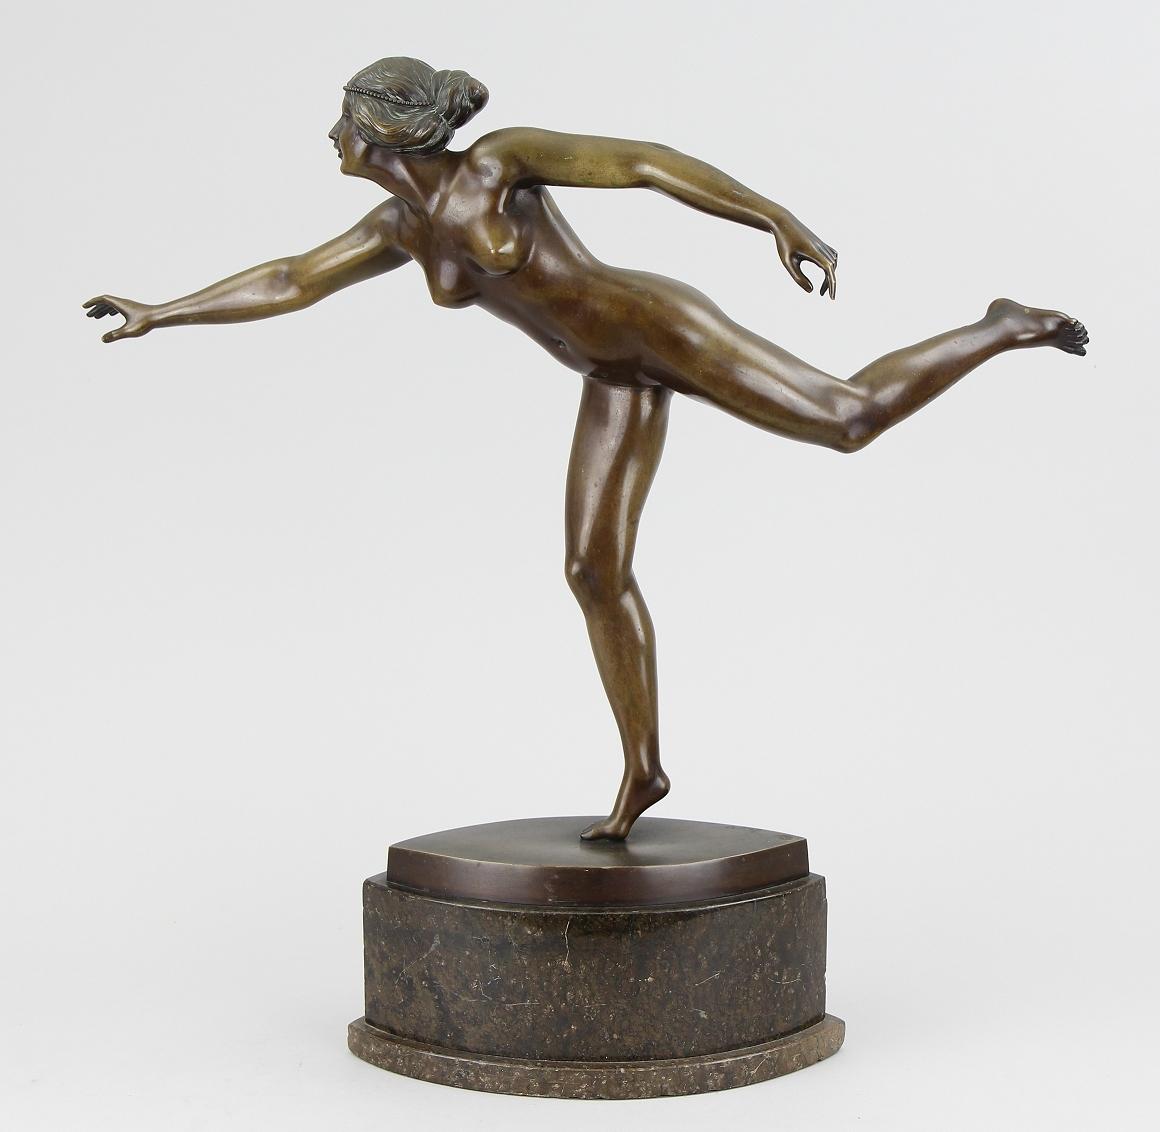 Bronzefigur G.Jaeger, Erlös 2200 €